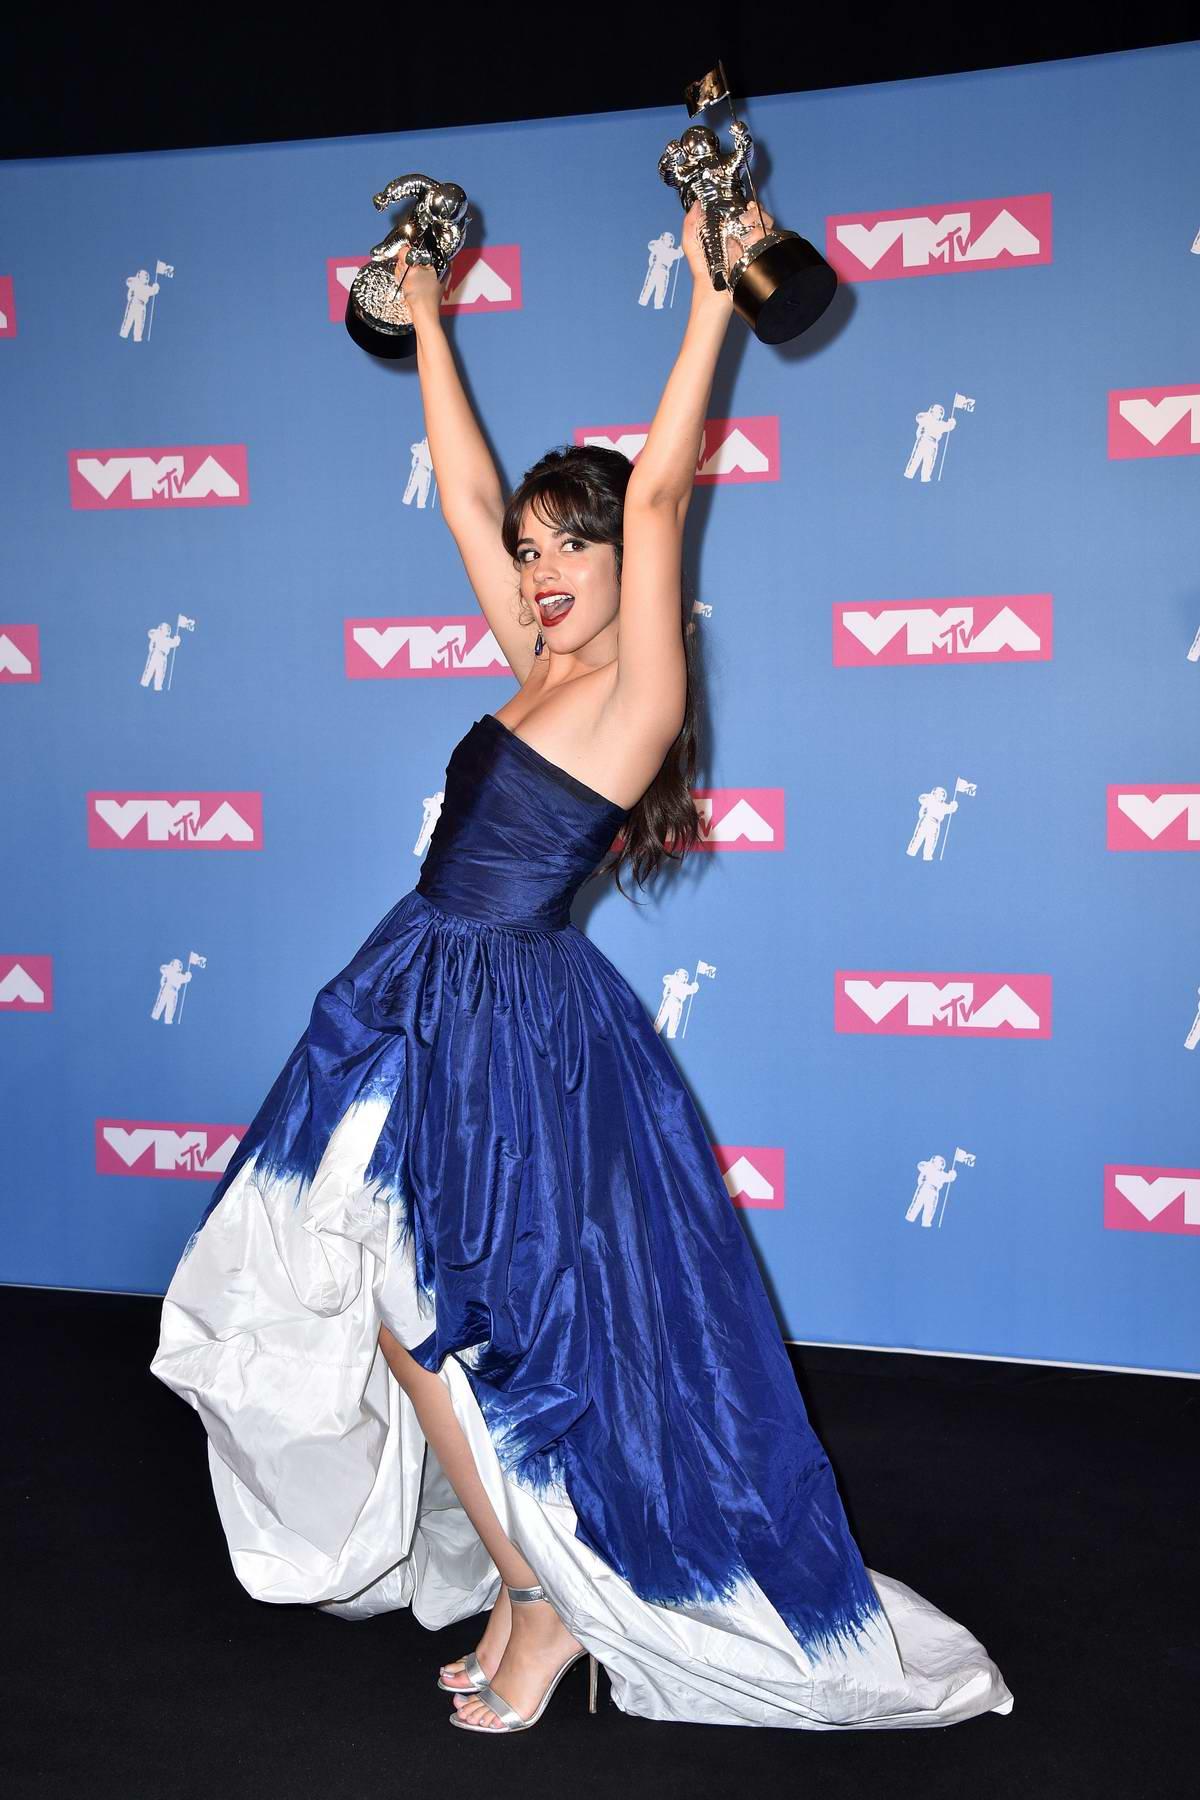 Camila Cabello attends 2018 MTV Video Music Awards (MTV VMA 2018) at Radio City Music Hall in New York City